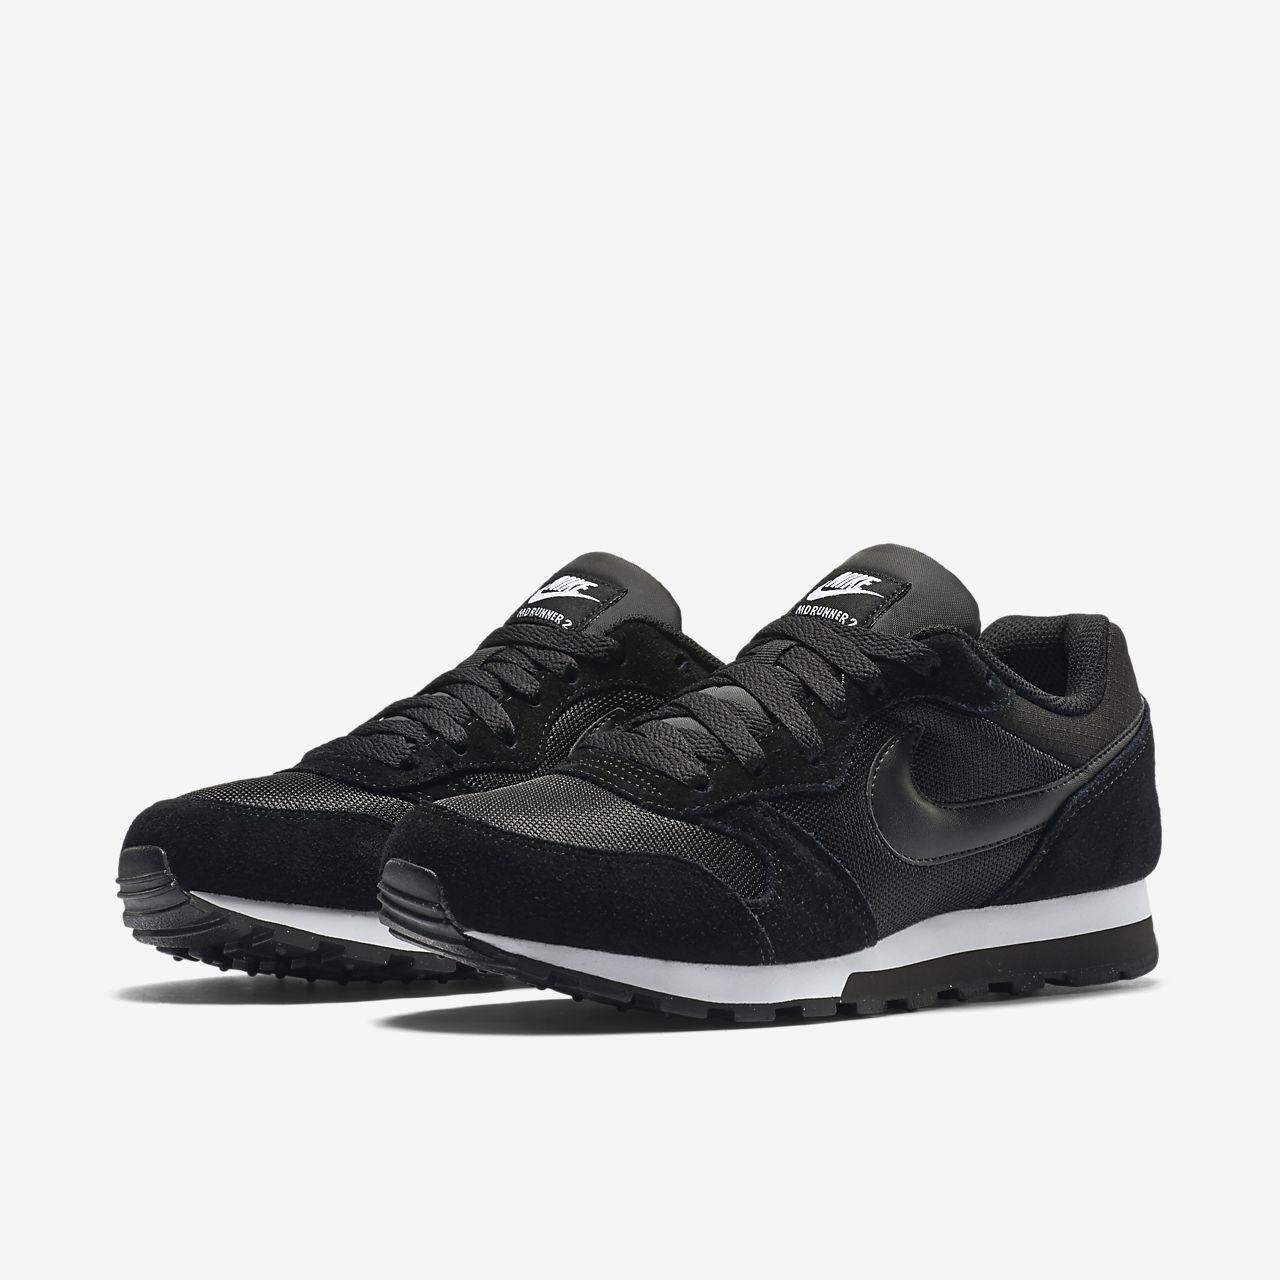 MD Runner 2 Damesschoen. Nike NL Vrouwen nike schoenen